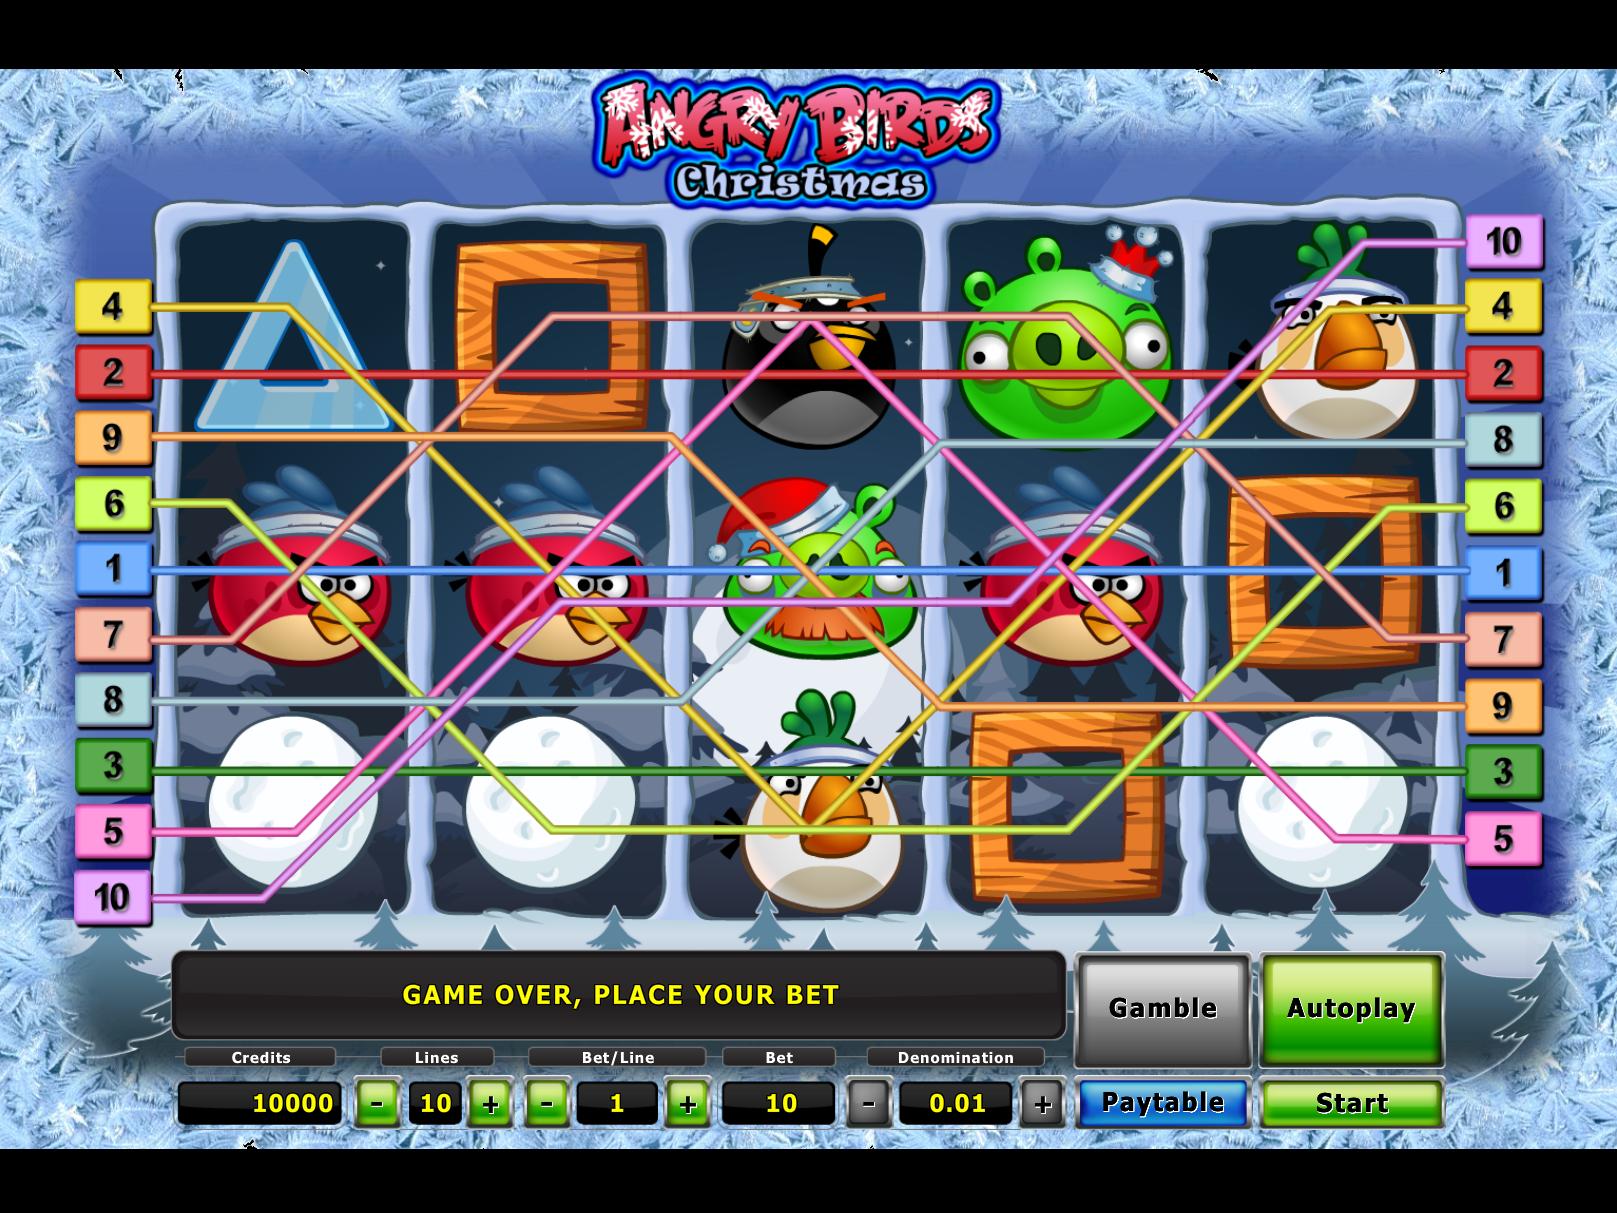 Jetzt Angry Birds Christmas online spielen